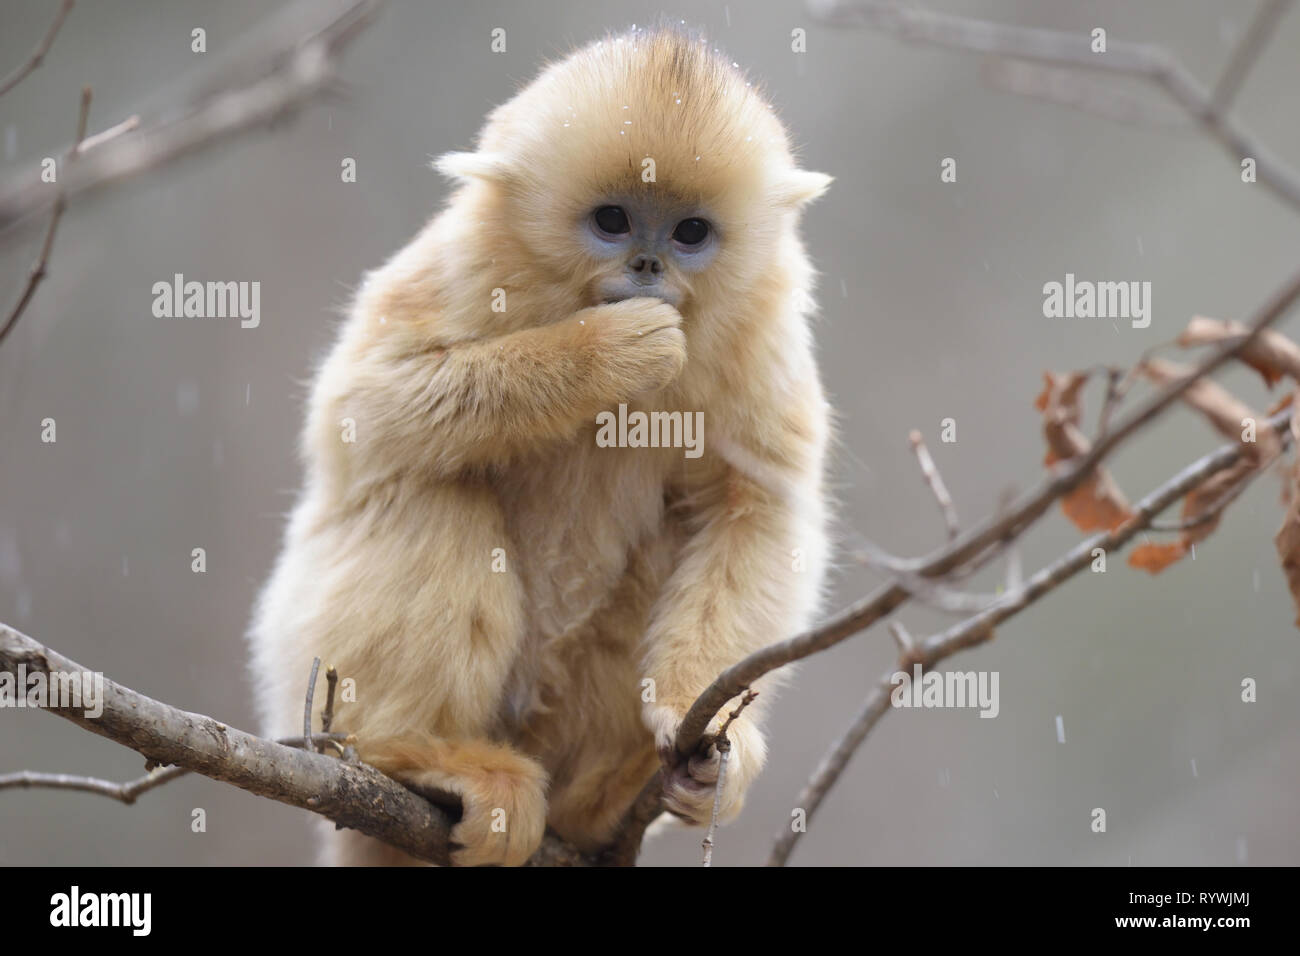 Cute baby Golden Snub-nosed Monkey (Rhinopithecus roxellana) in the snow - Stock Image